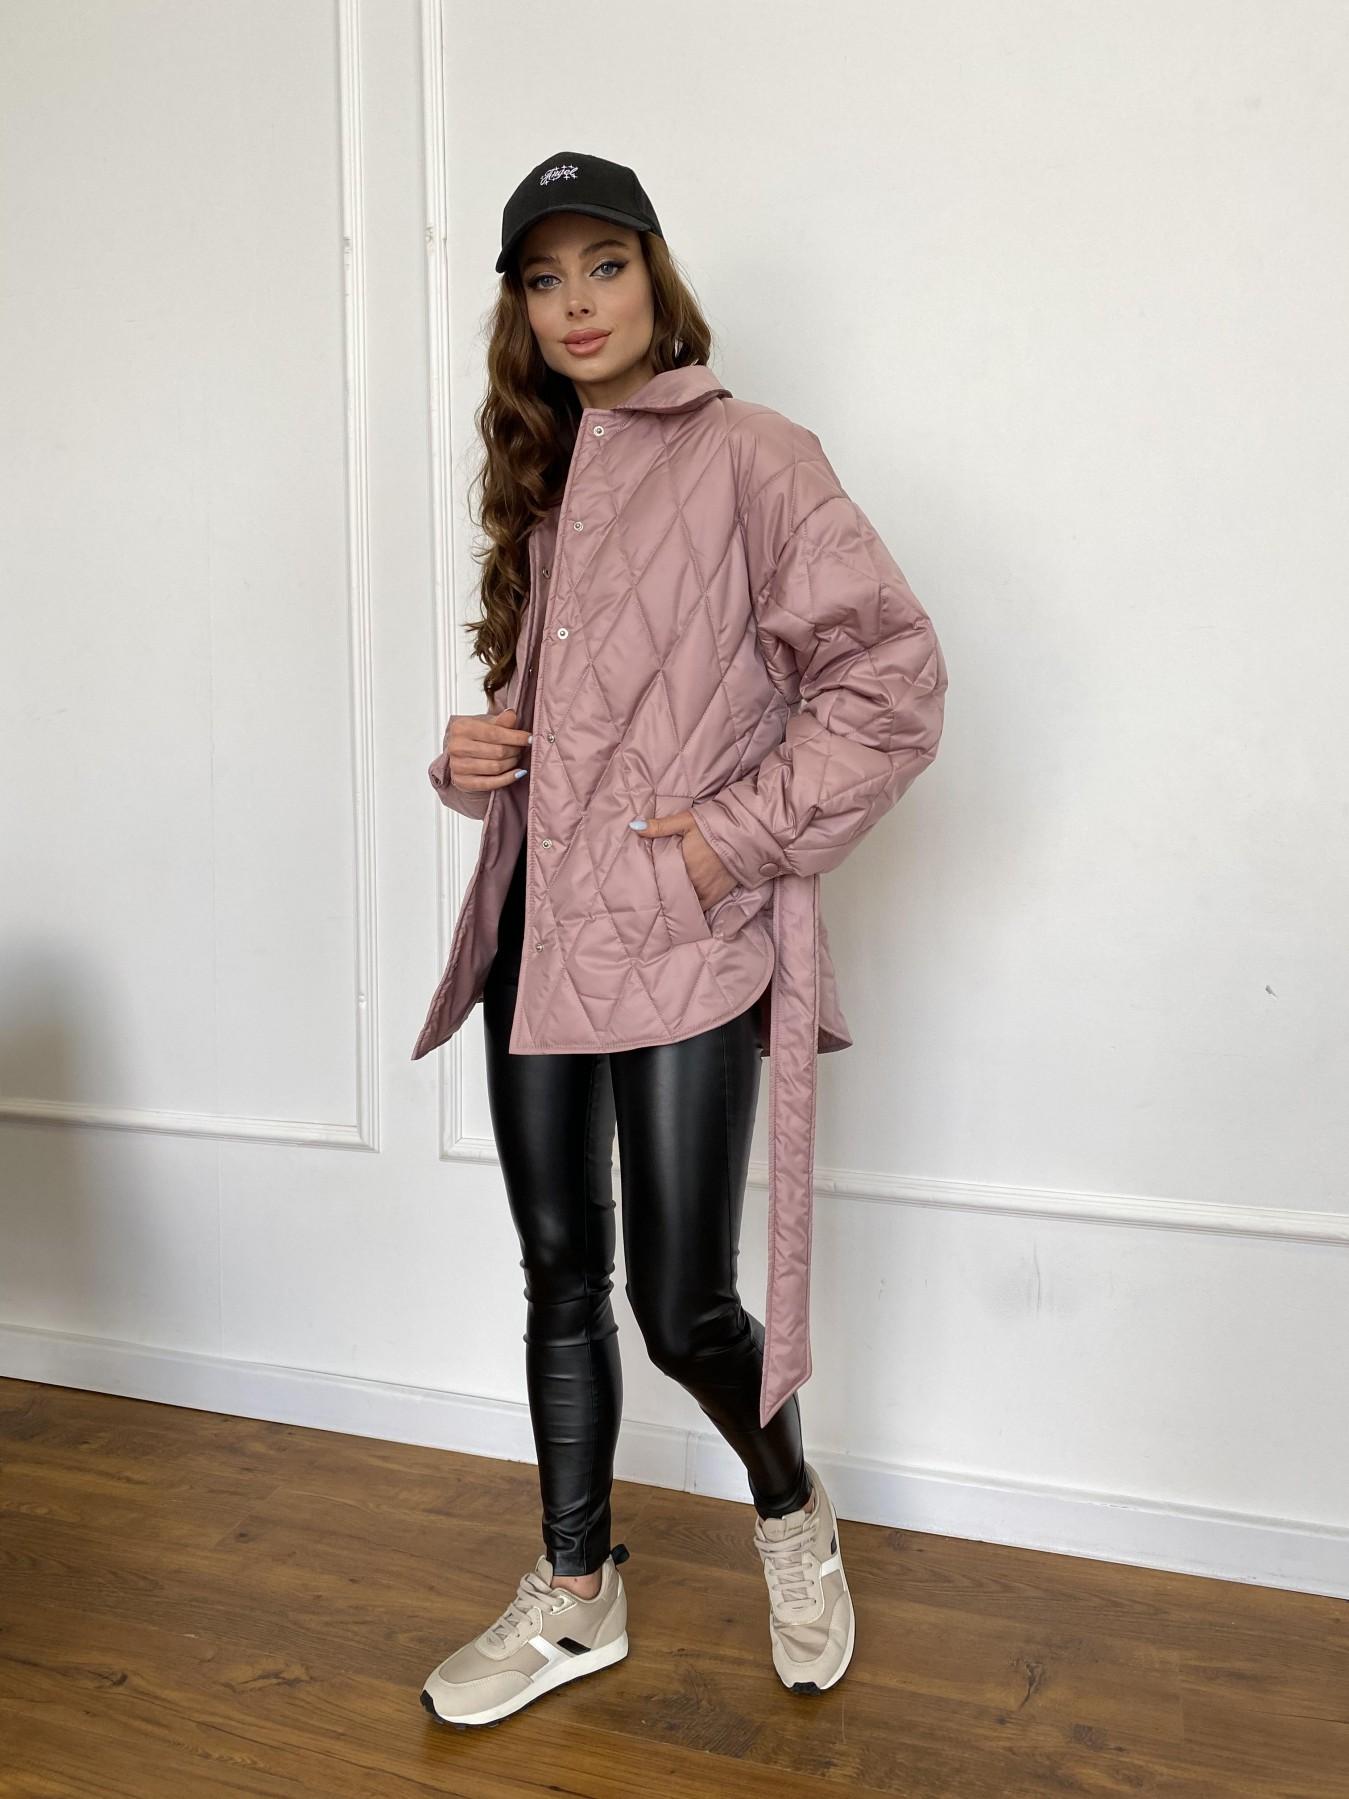 Моно  куртка из плащевой ткани Gloria 11081 АРТ. 47647 Цвет: Пудра - фото 13, интернет магазин tm-modus.ru